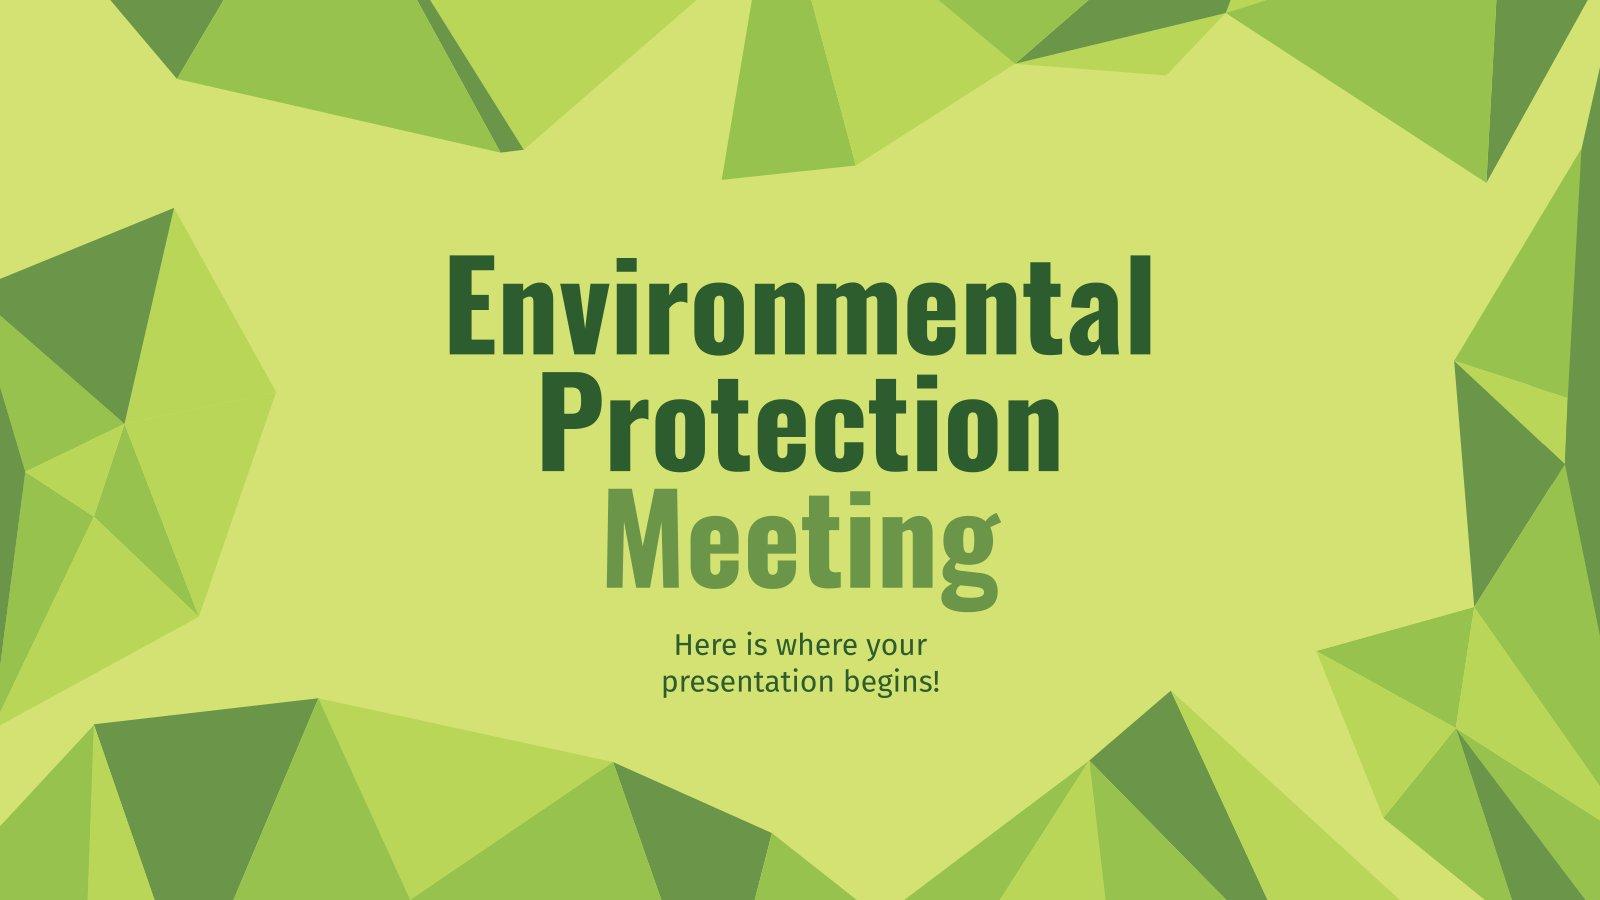 Environmental Protection Meeting presentation template